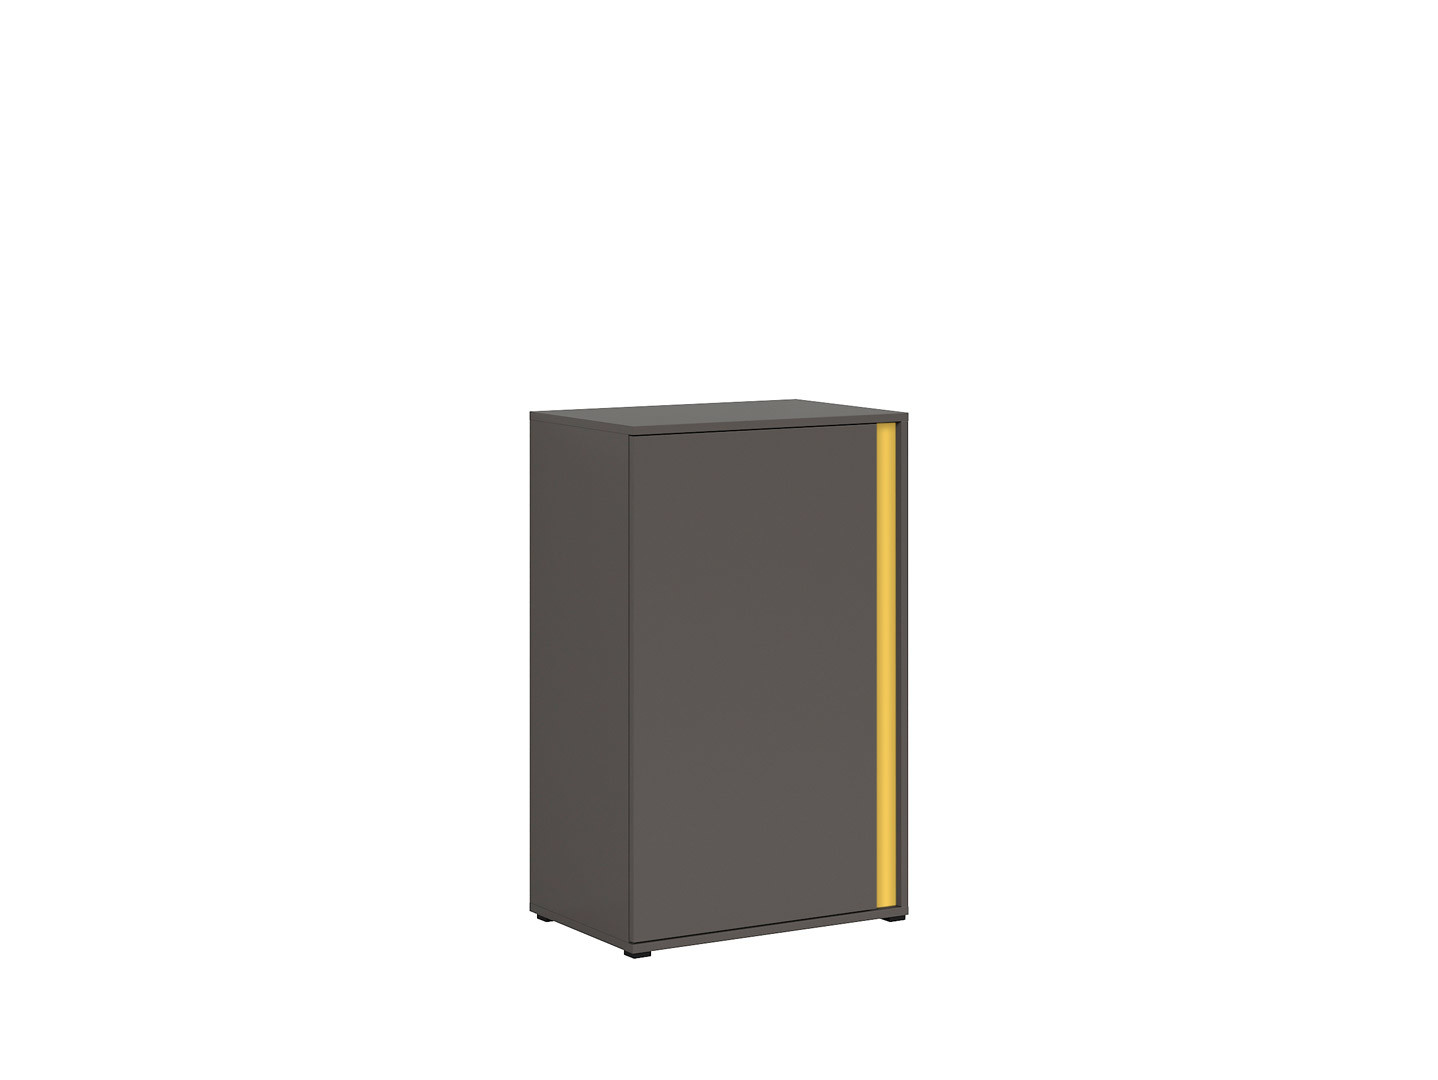 Skrinka GRAPHIC KOM1DL/C sivý wolfram